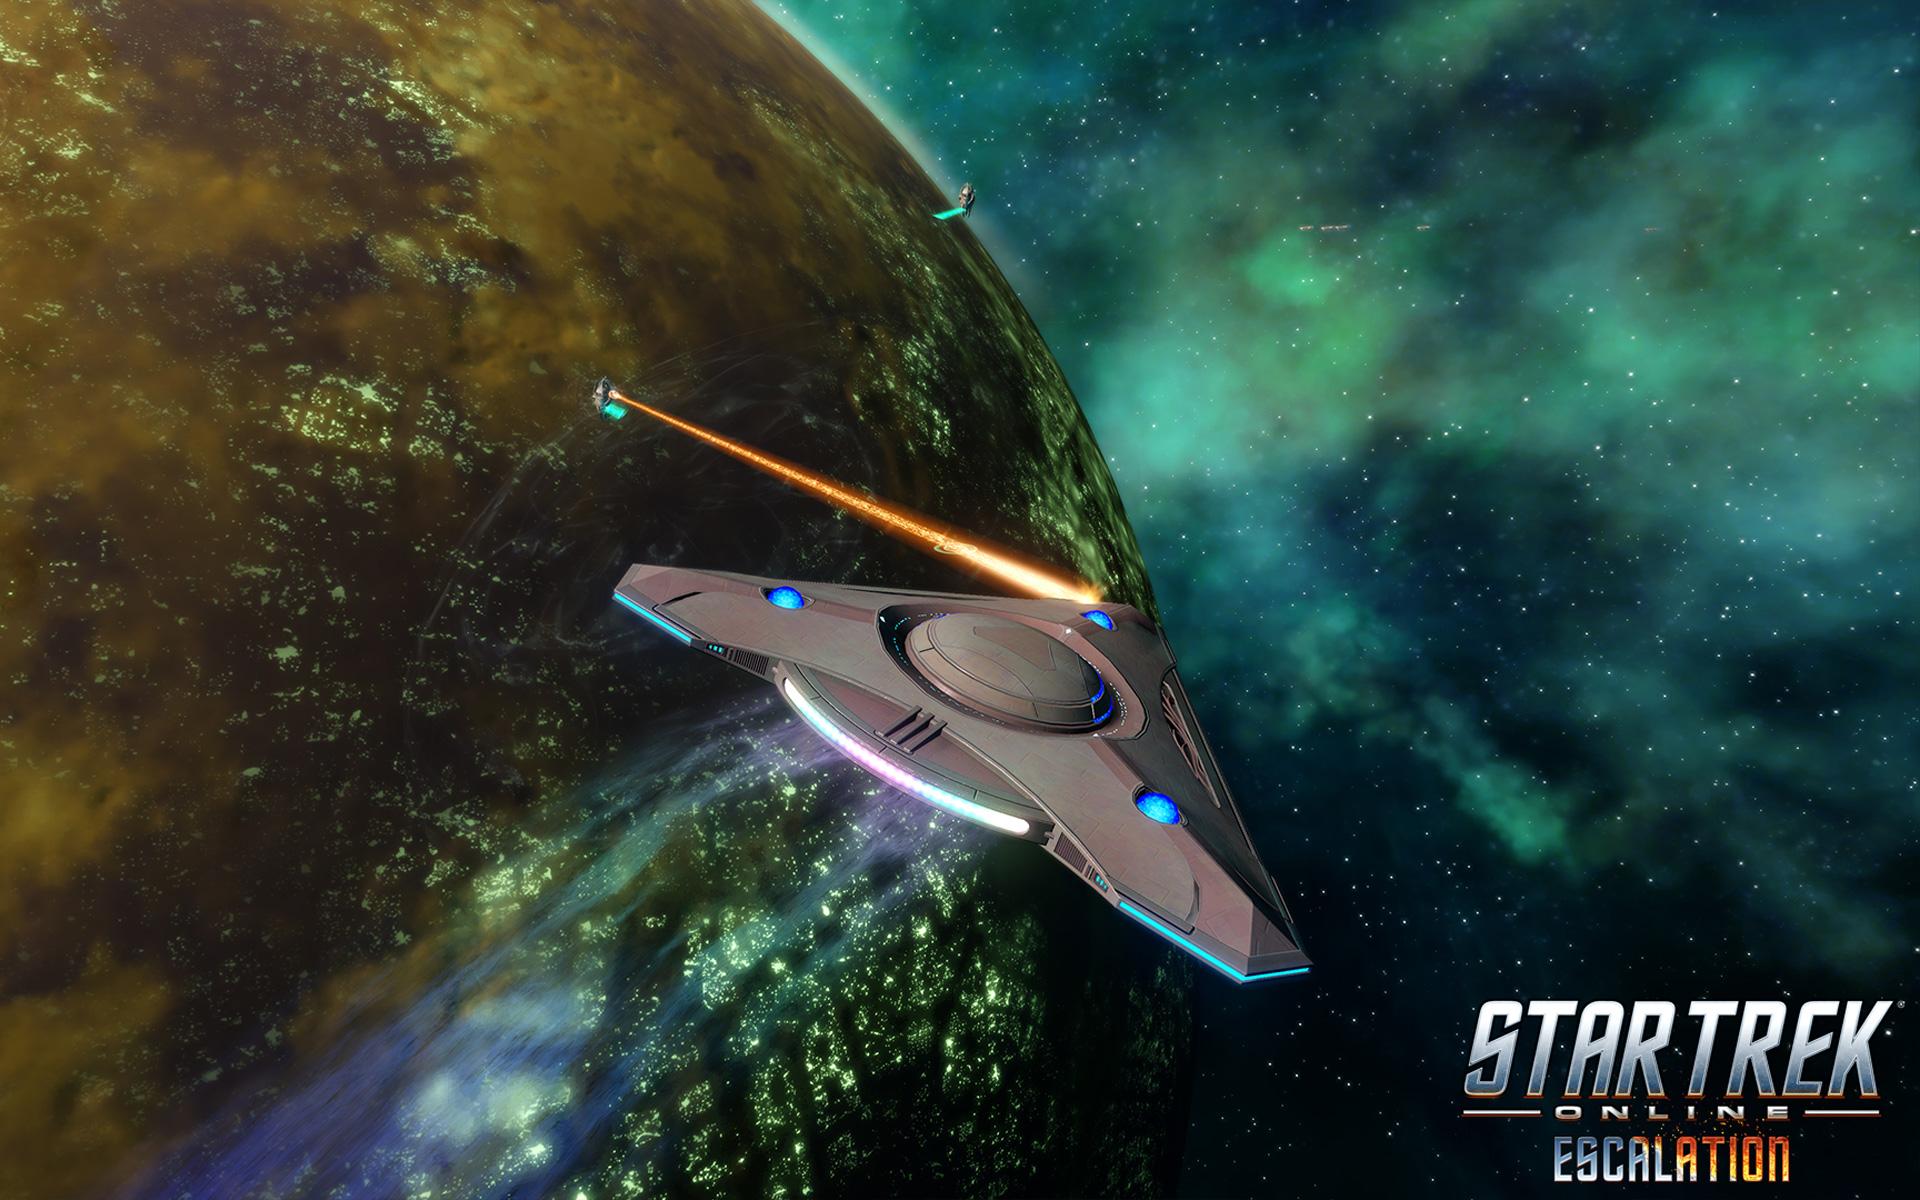 Free Star Trek Online Wallpaper in 1920x1200